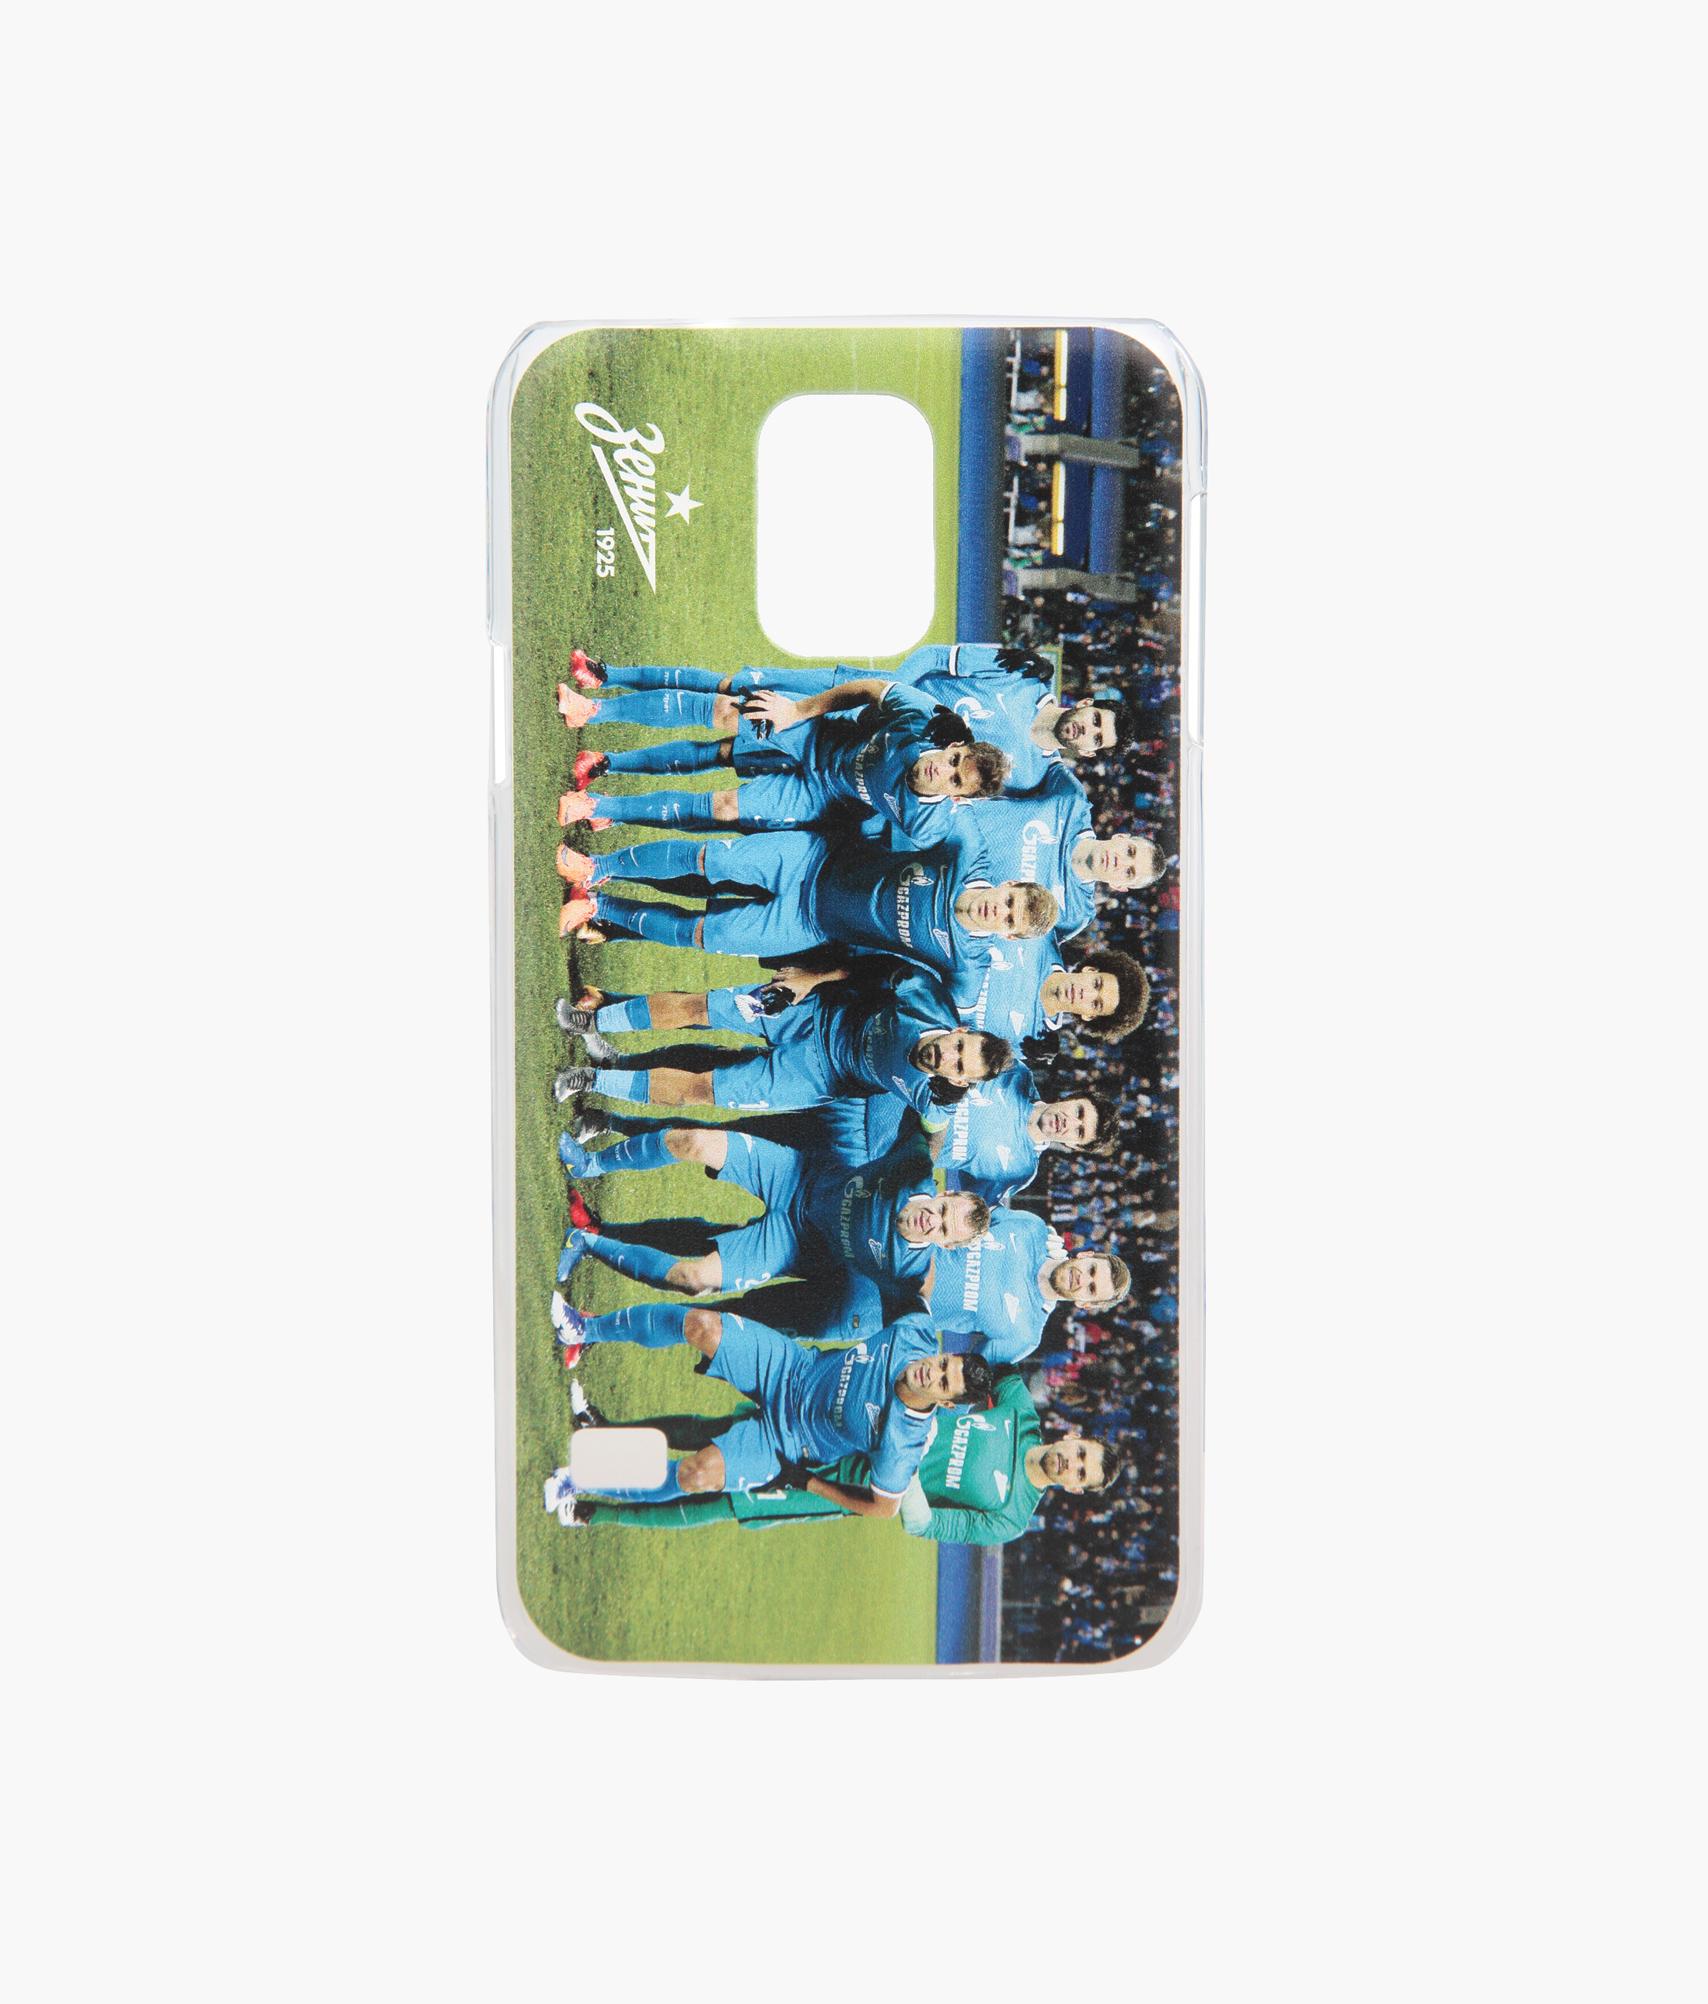 Фото - Чехол Samsung Galaxy S5 «Команда» Зенит аксессуар чехол neypo для samsung galaxy a70 2019 premium silver nsb11648